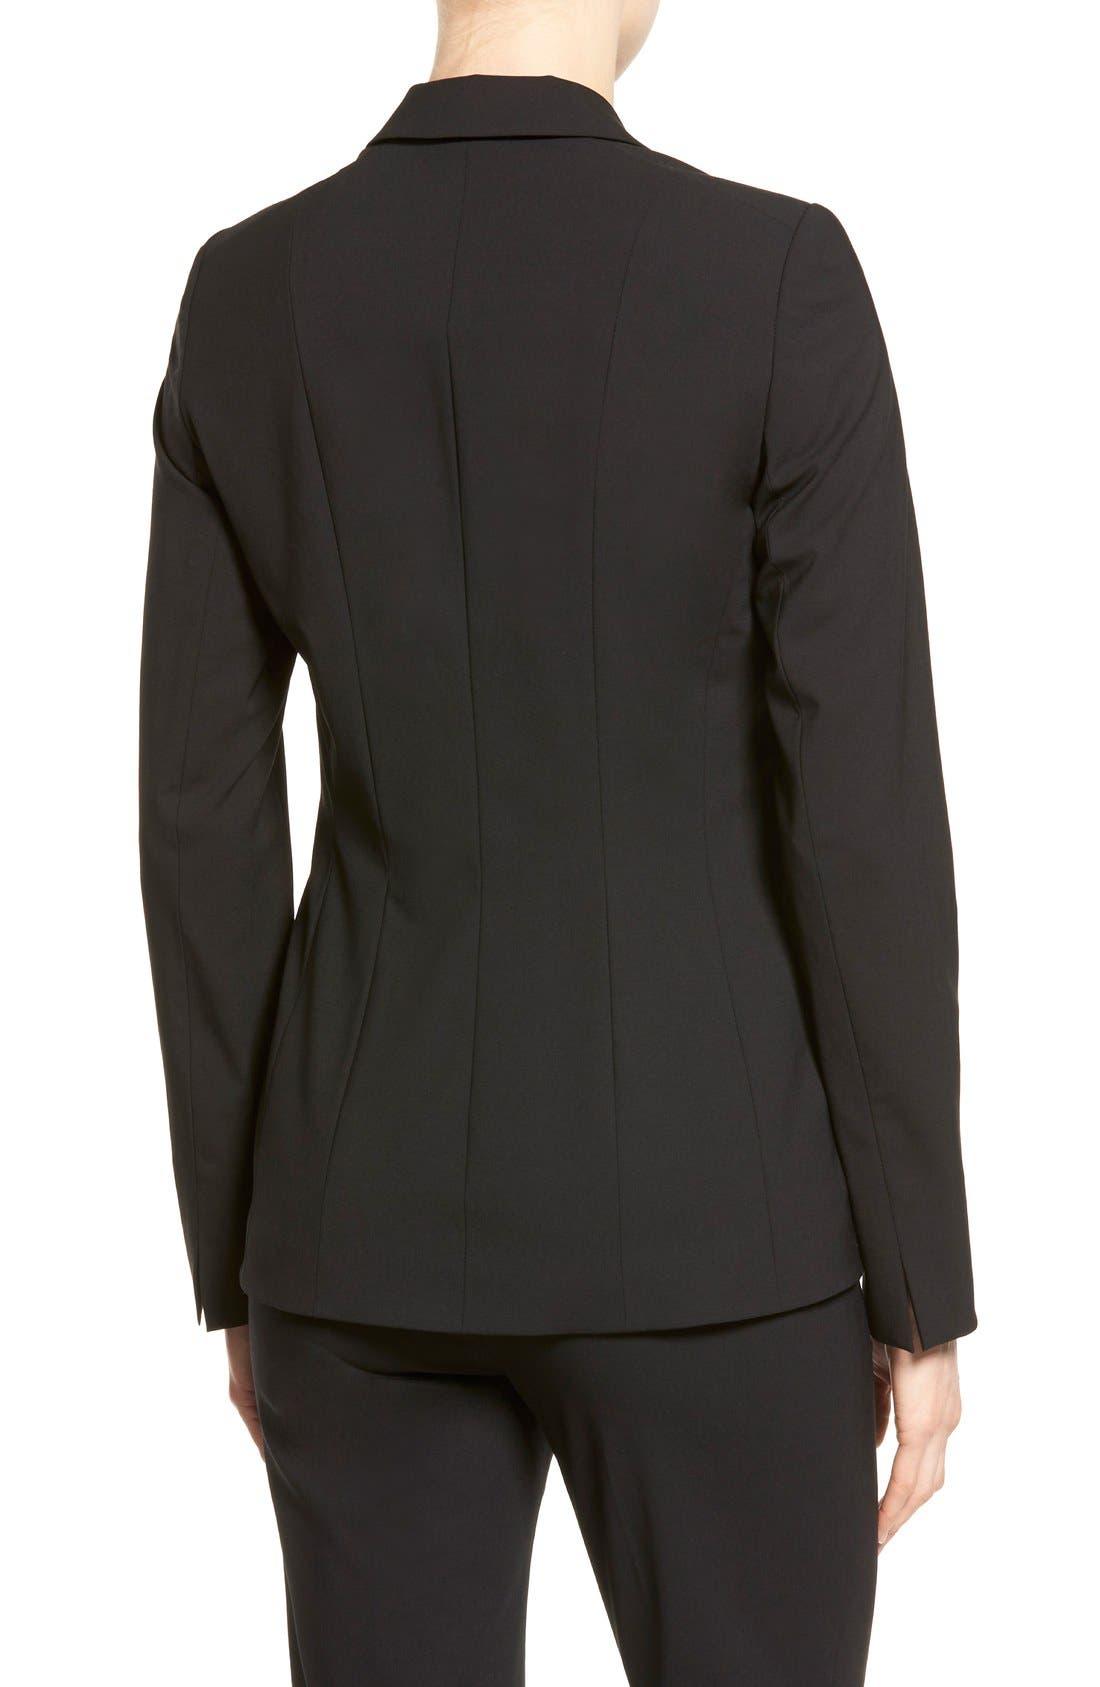 Alternate Image 2  - Lafayette 148 New York 'Rhonda' Stretch Wool Jacket